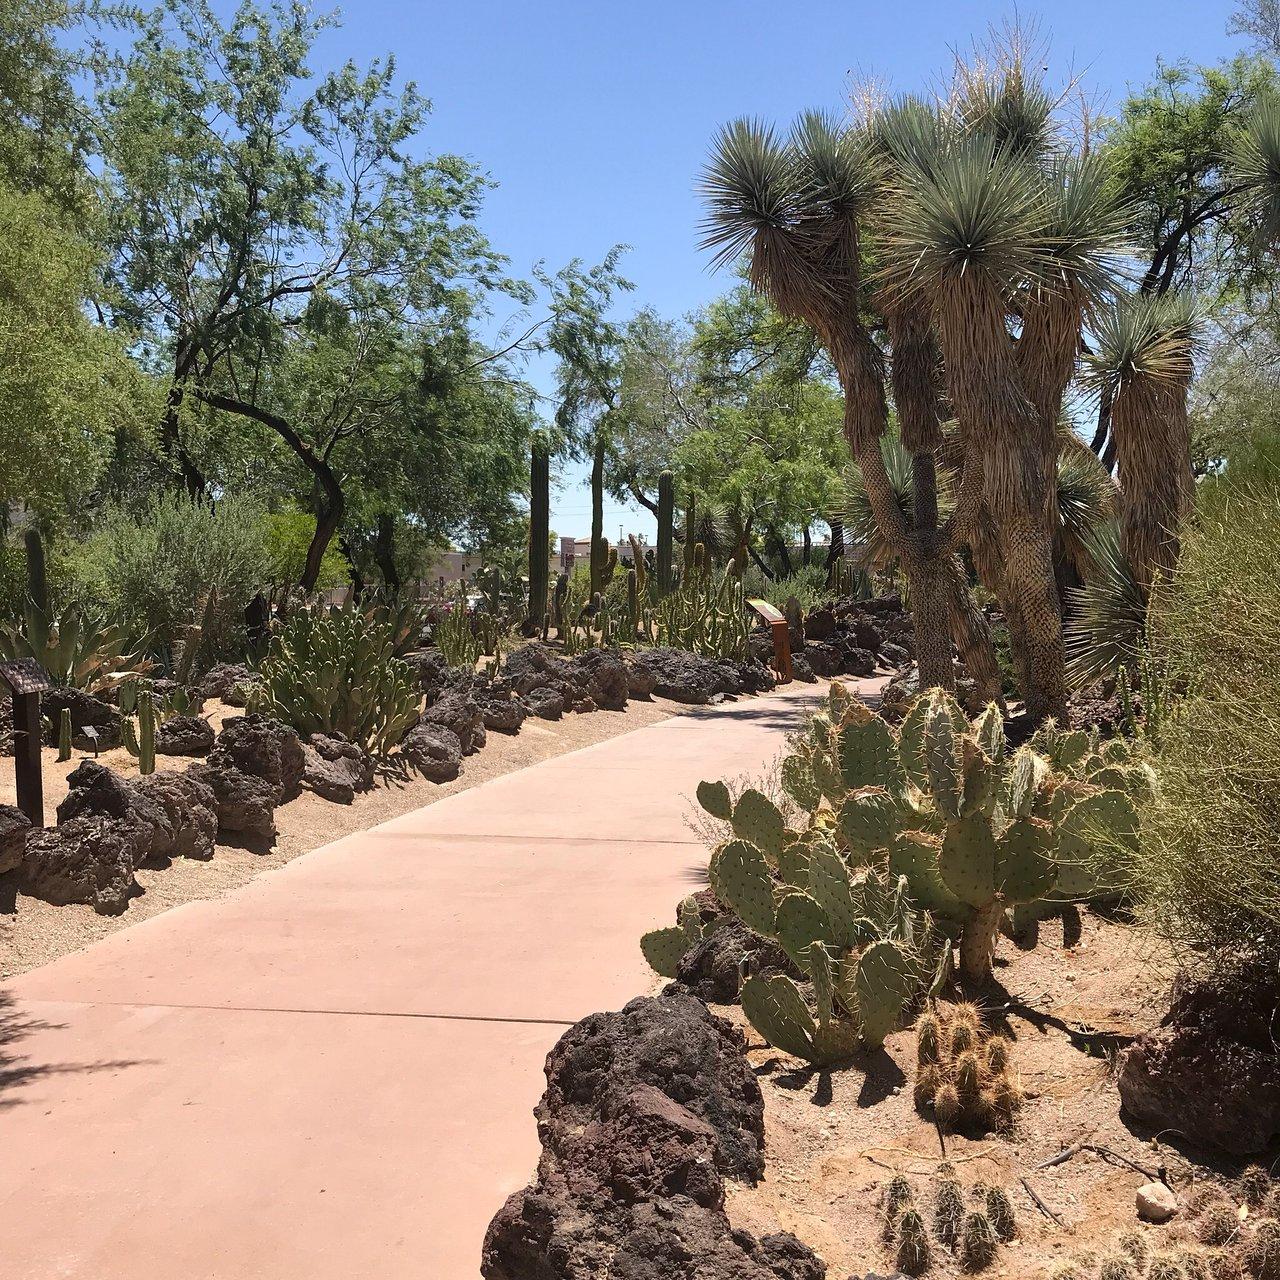 Ethel M Chocolates Las Vegas 2020 All You Need To Know Before You Go With Photos Tripadvisor